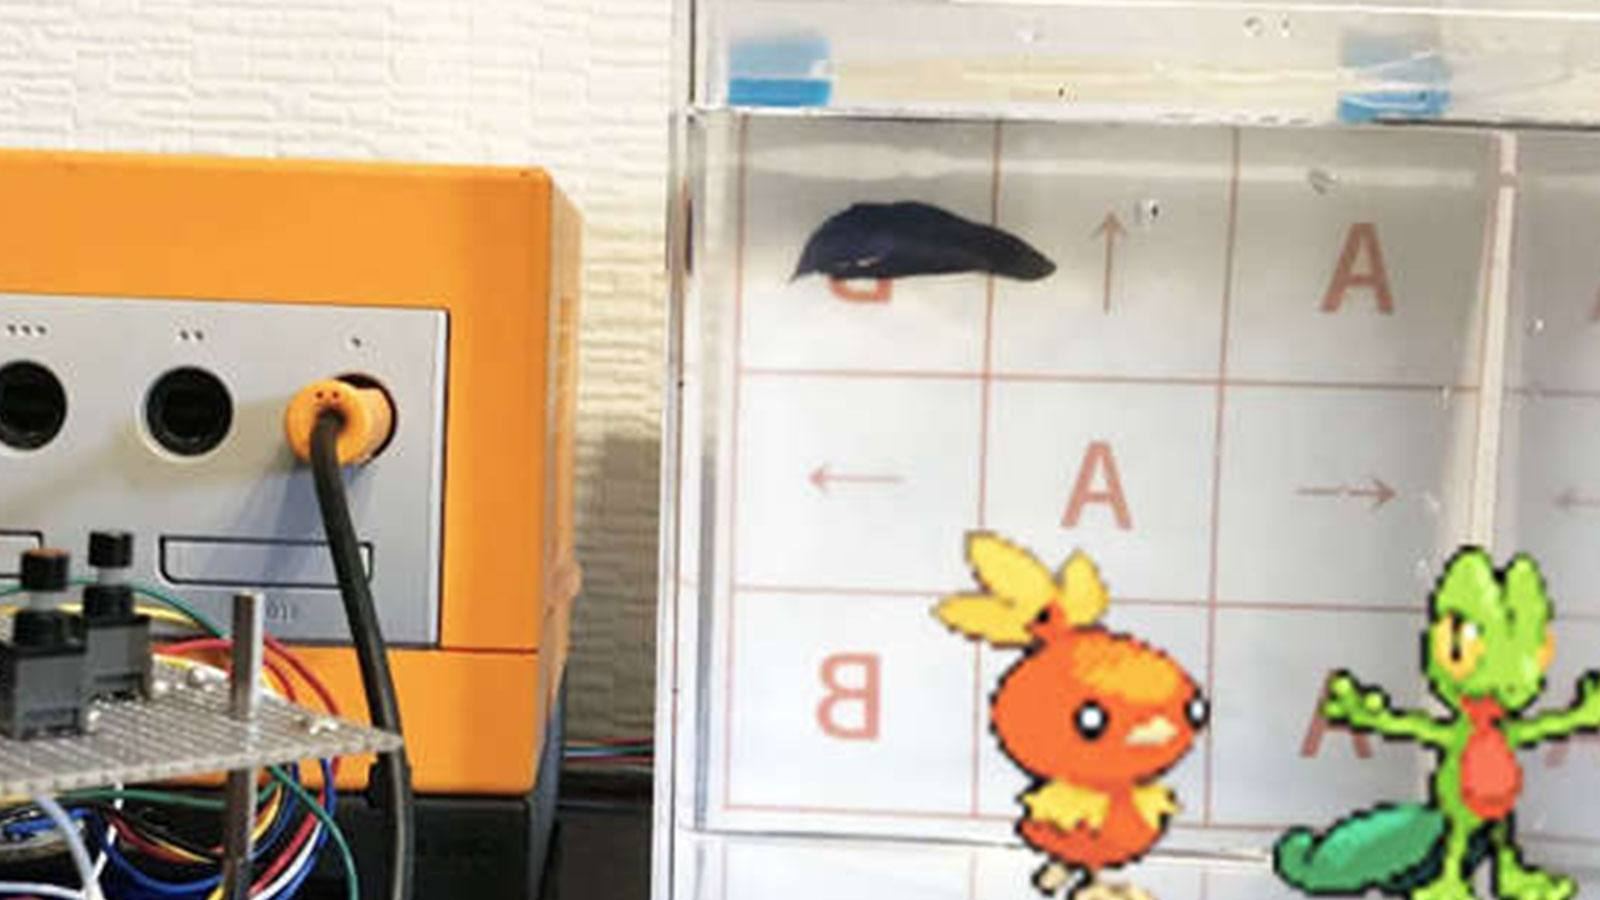 système poisson combattant pokémon rubis mutekimaru_ch